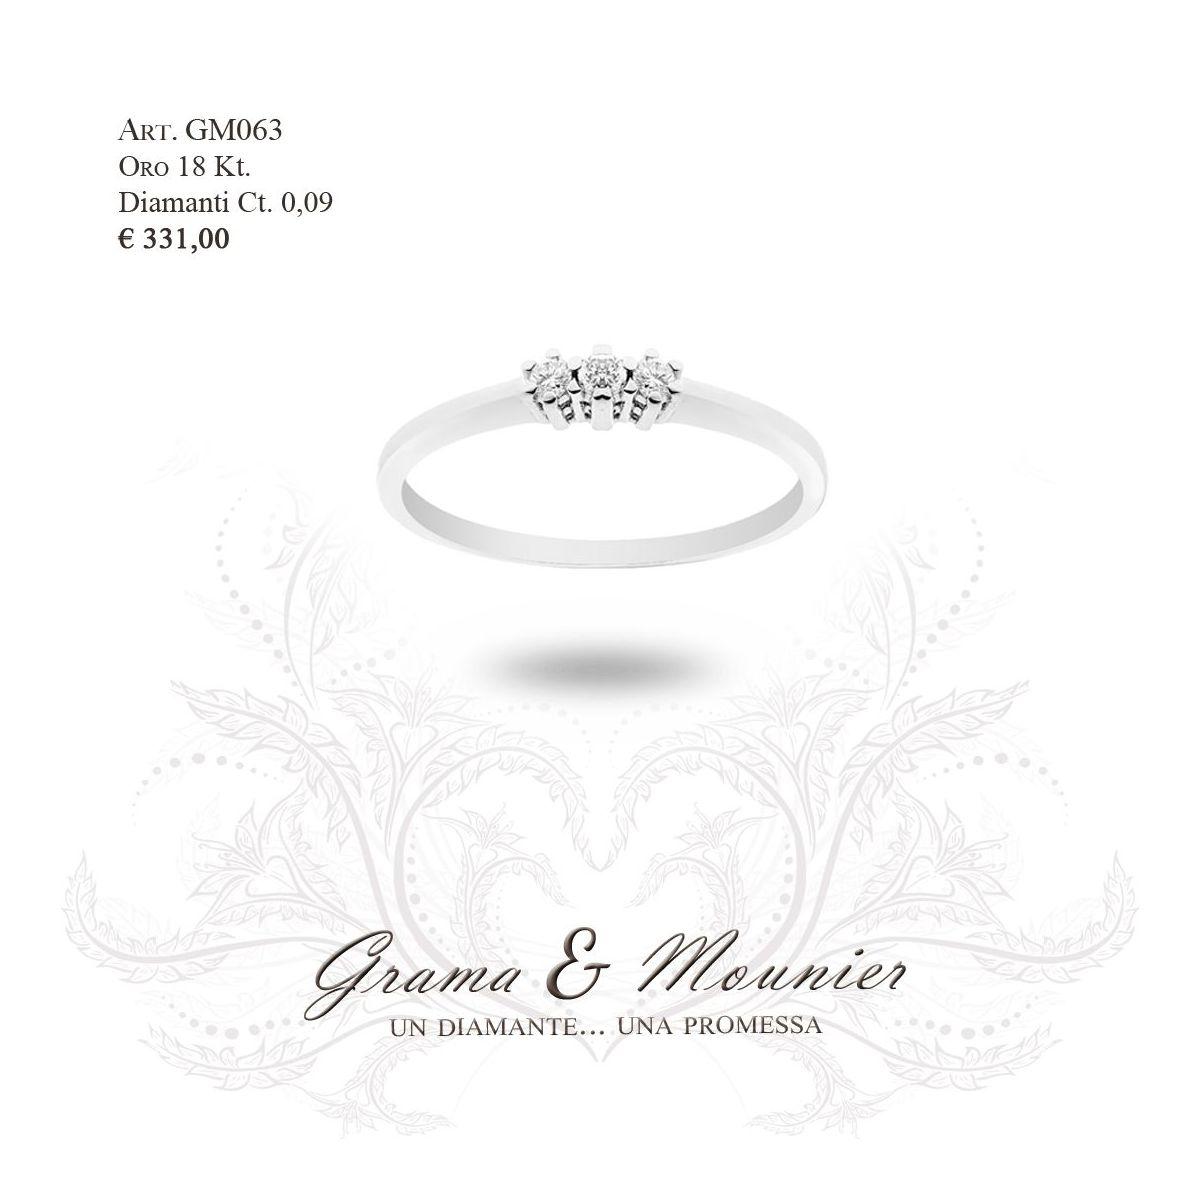 Anello in oro 18Kt. Grama&Mounier Art.GM063